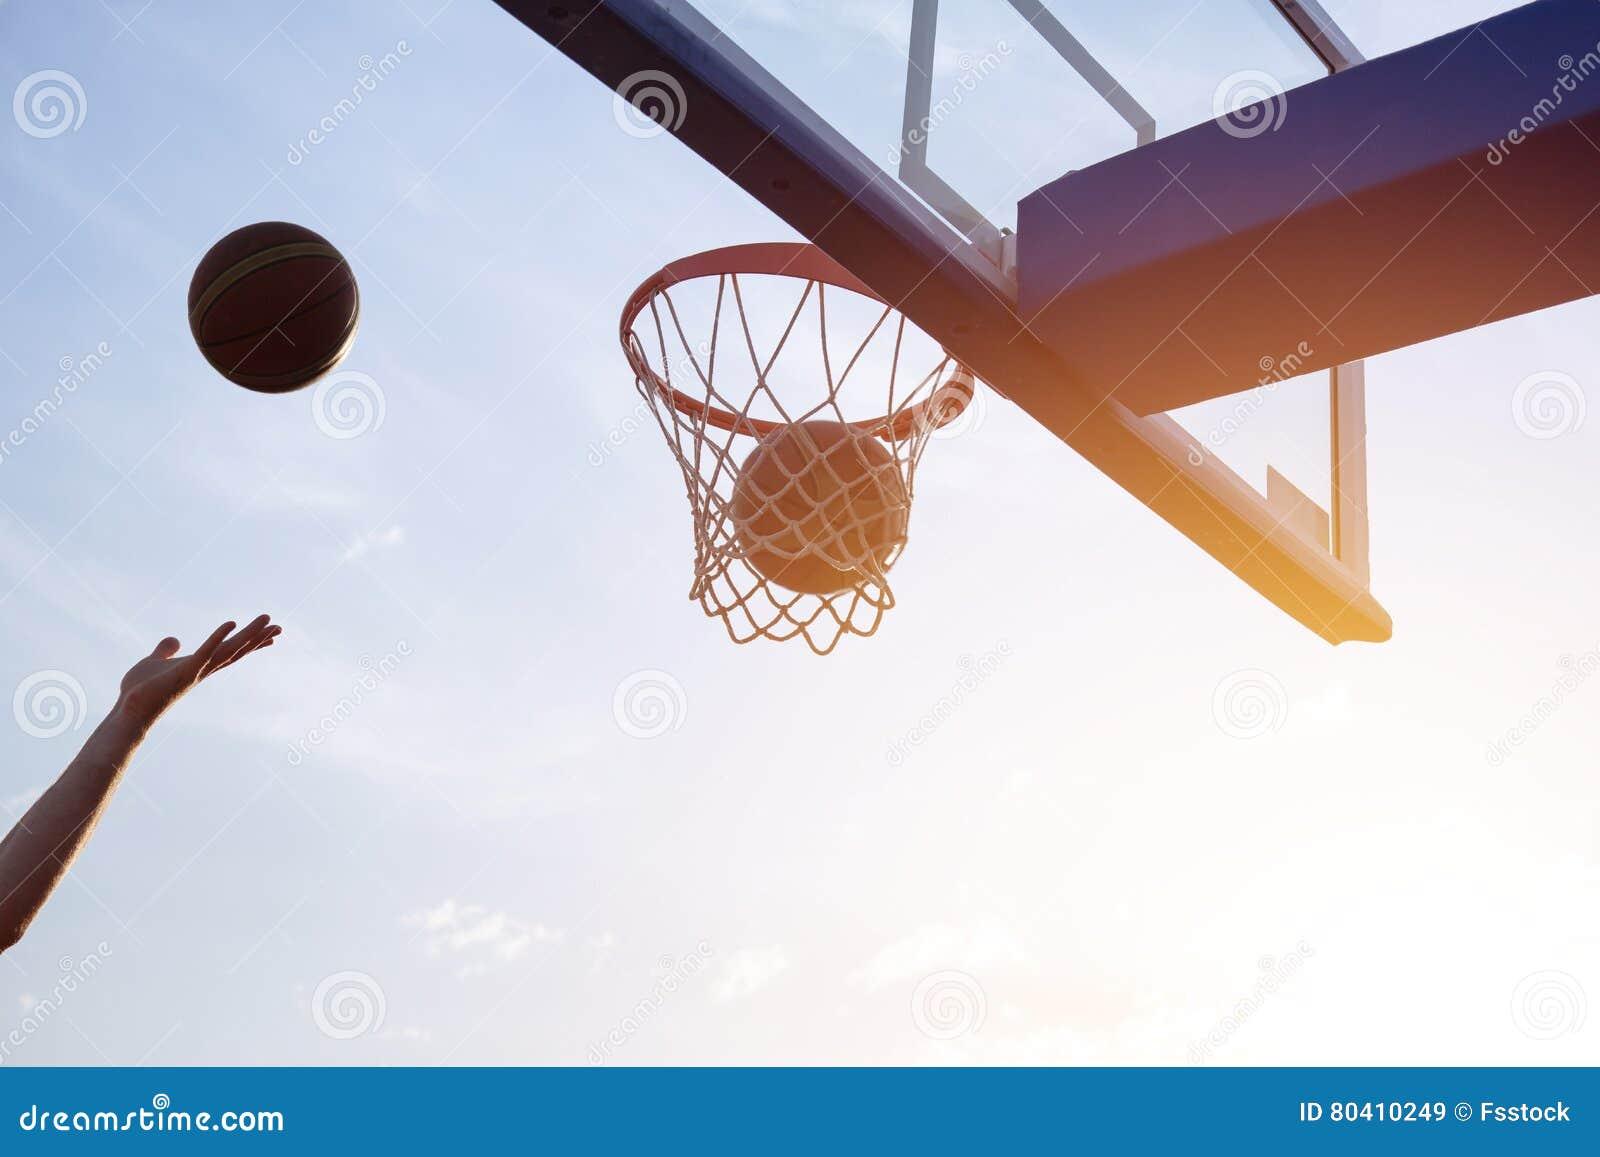 basketball going through the basket stock image image of